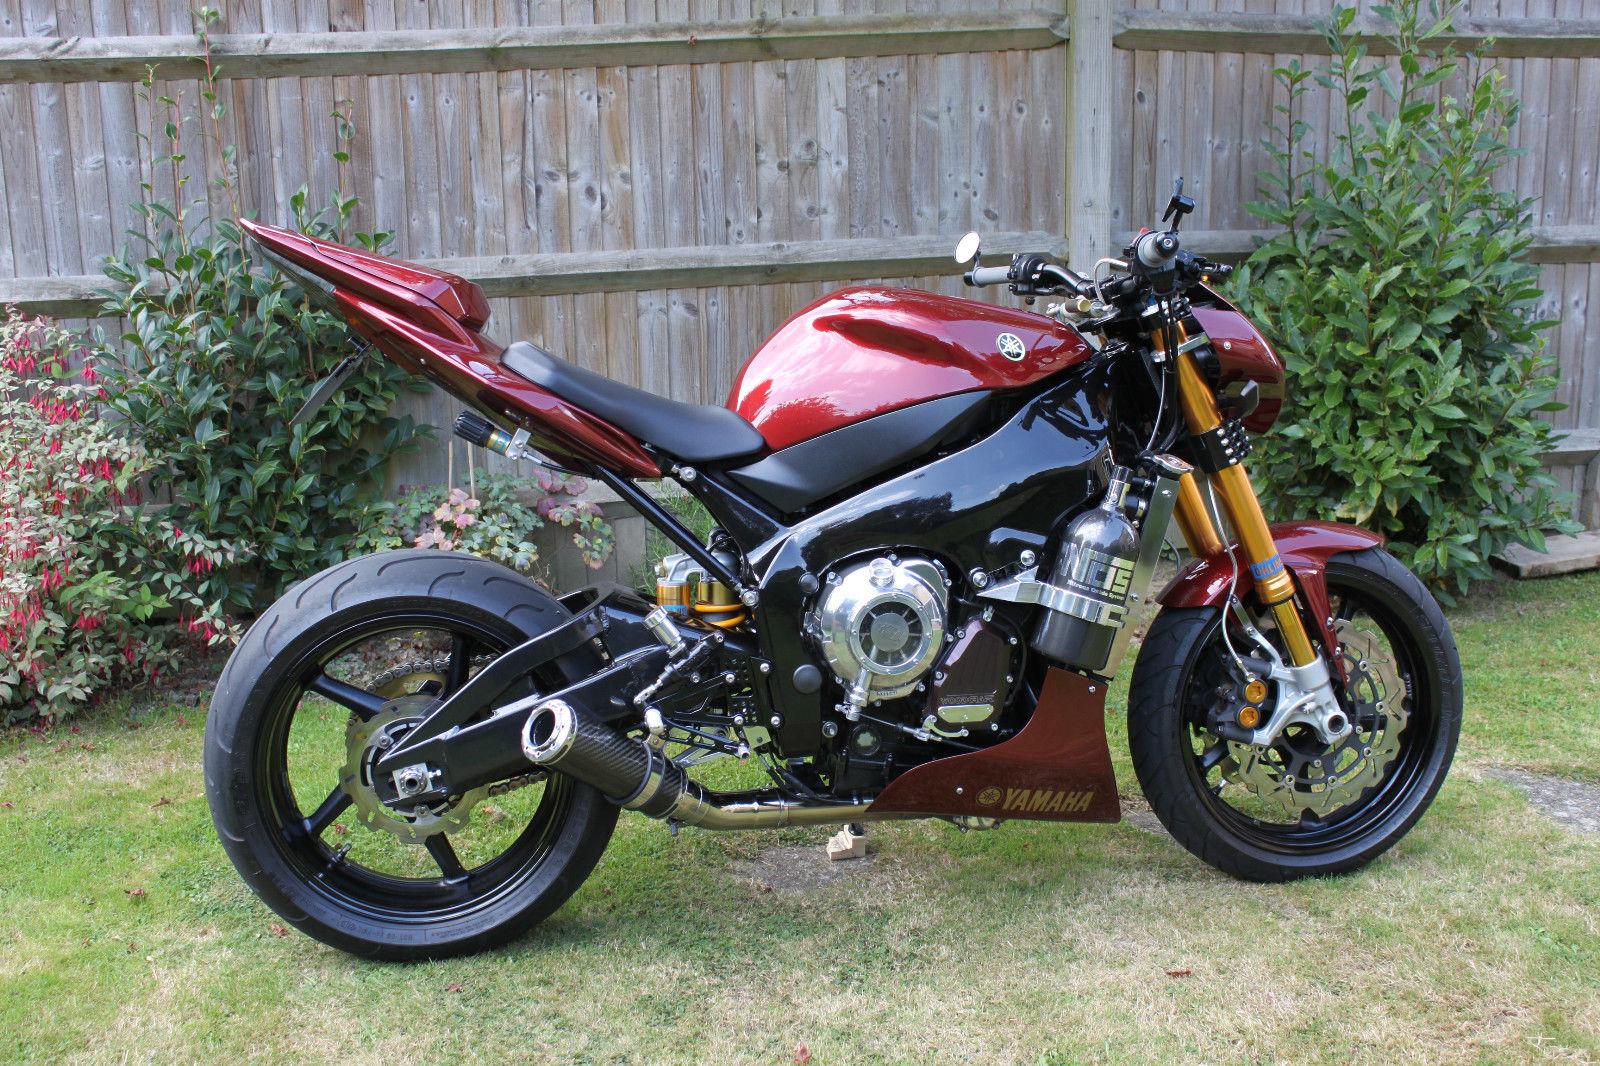 Yamaha 2003 R1 Custom Streetfighter  Yamaha 2003 R1 ...